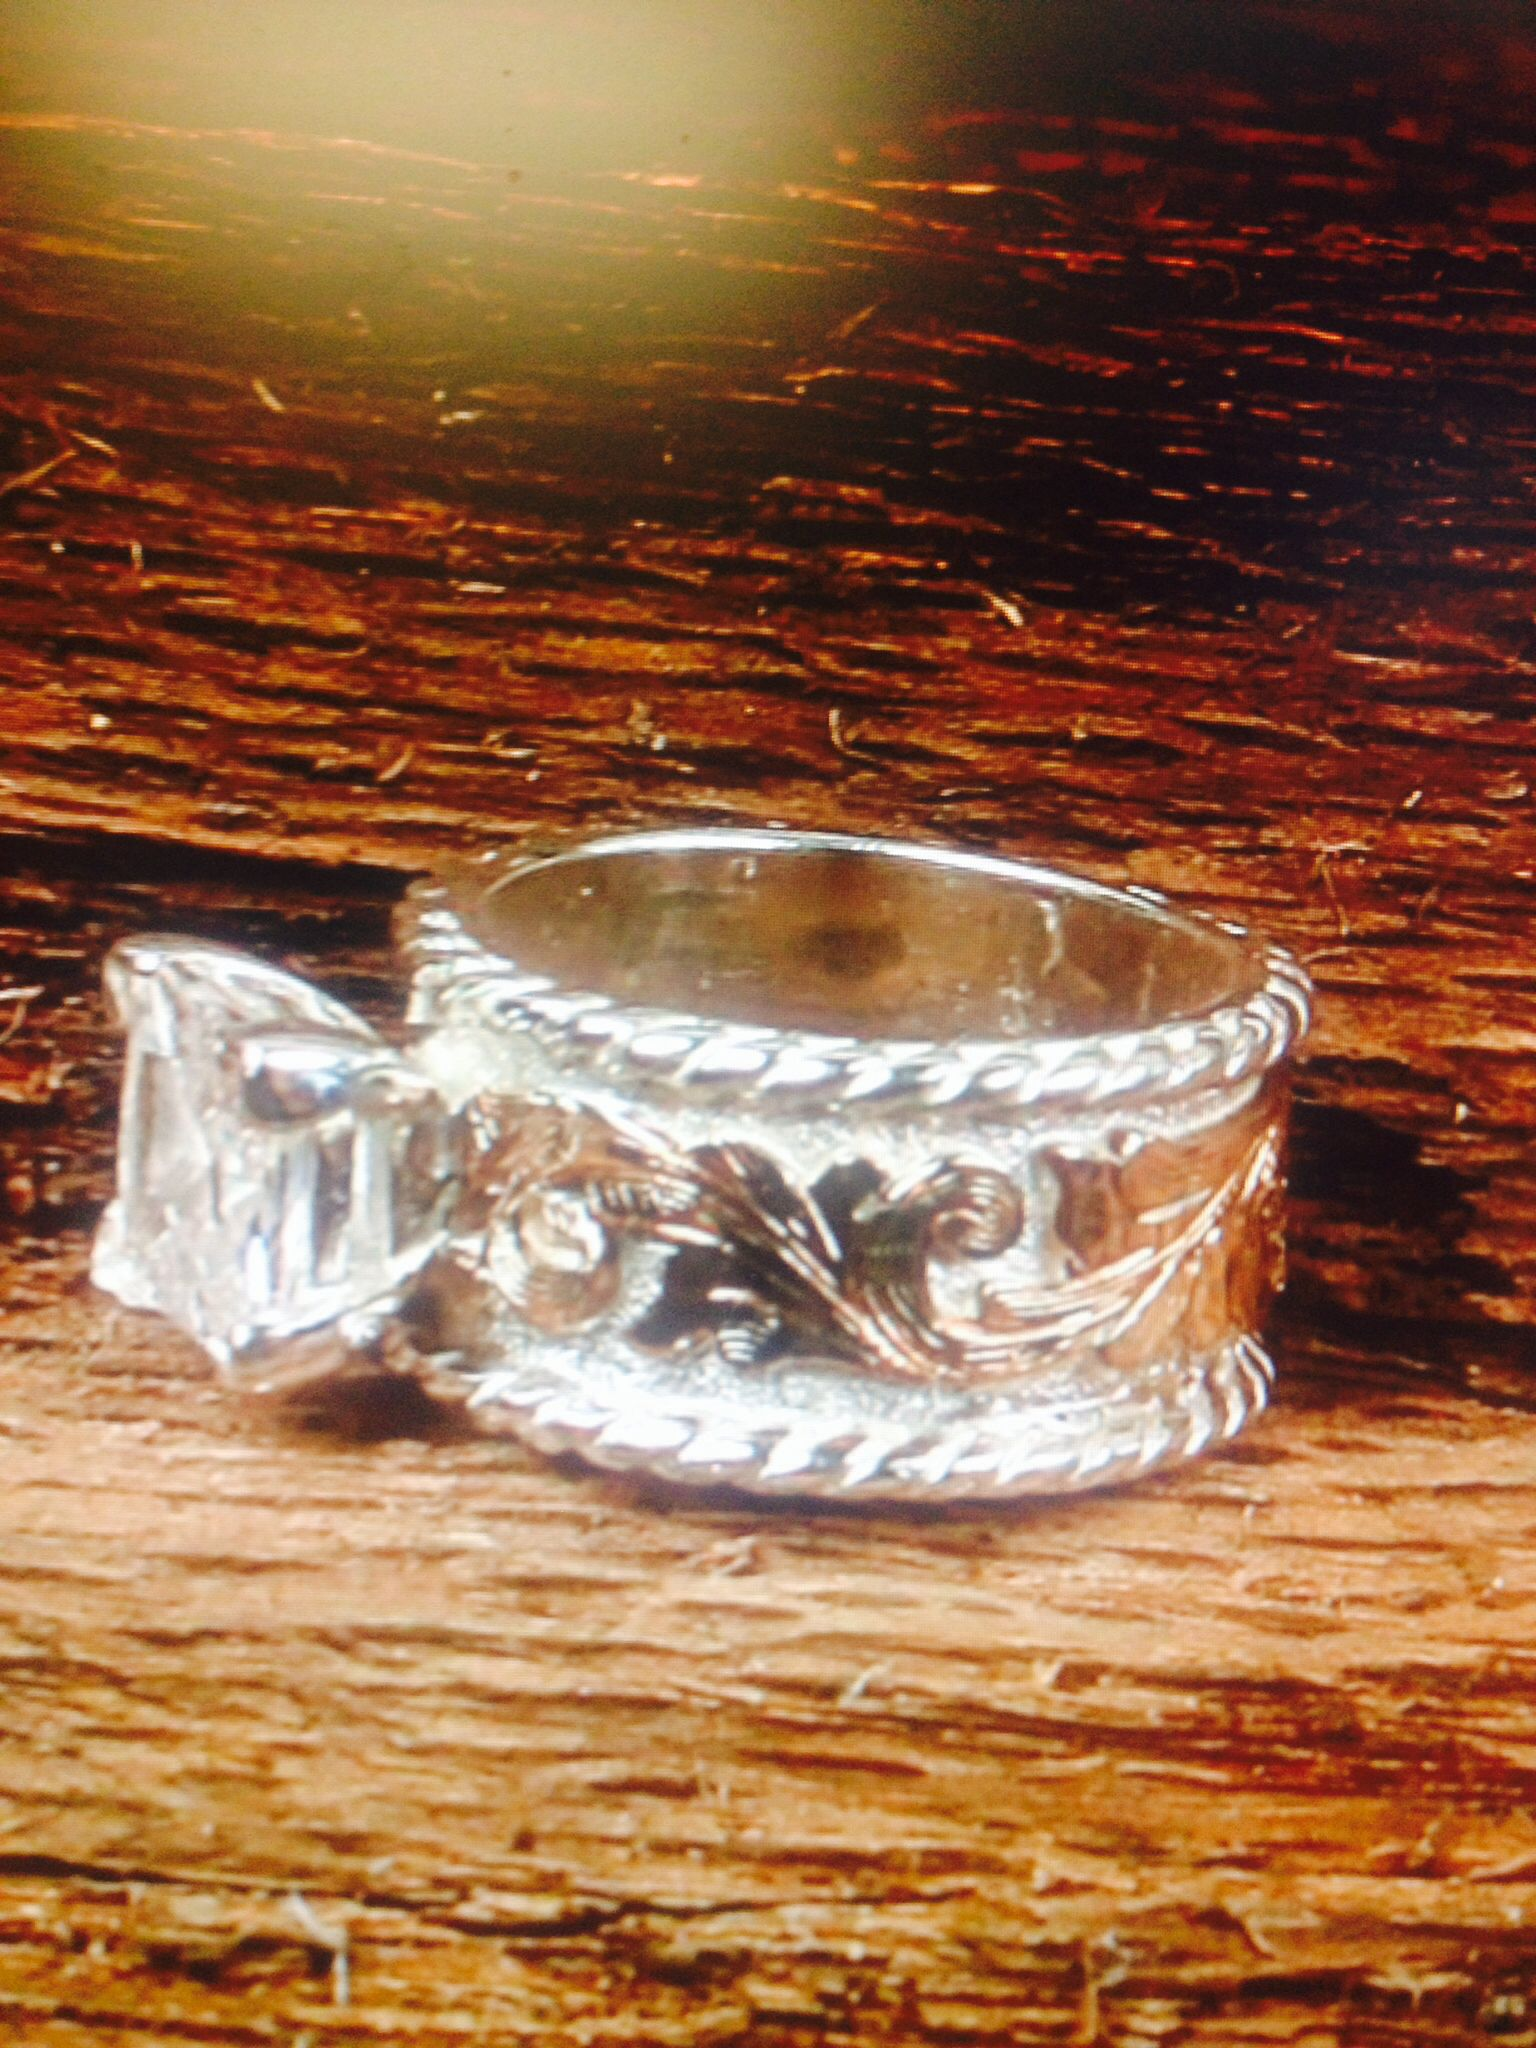 vitalium wedding band Western wedding ring Fanning Jewelry